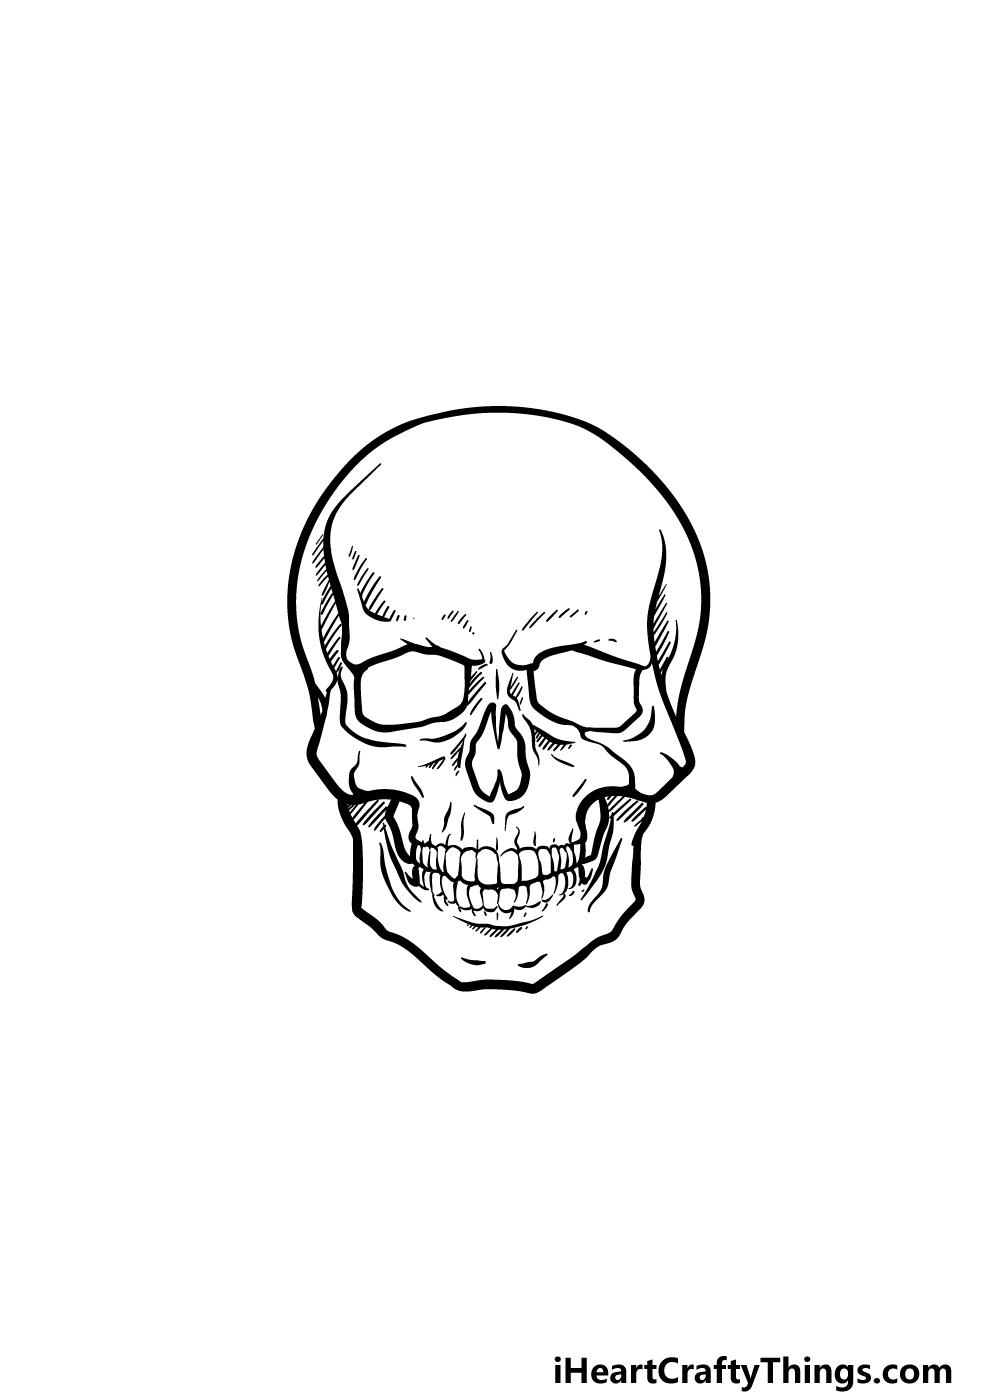 drawing a skeleton head step 5